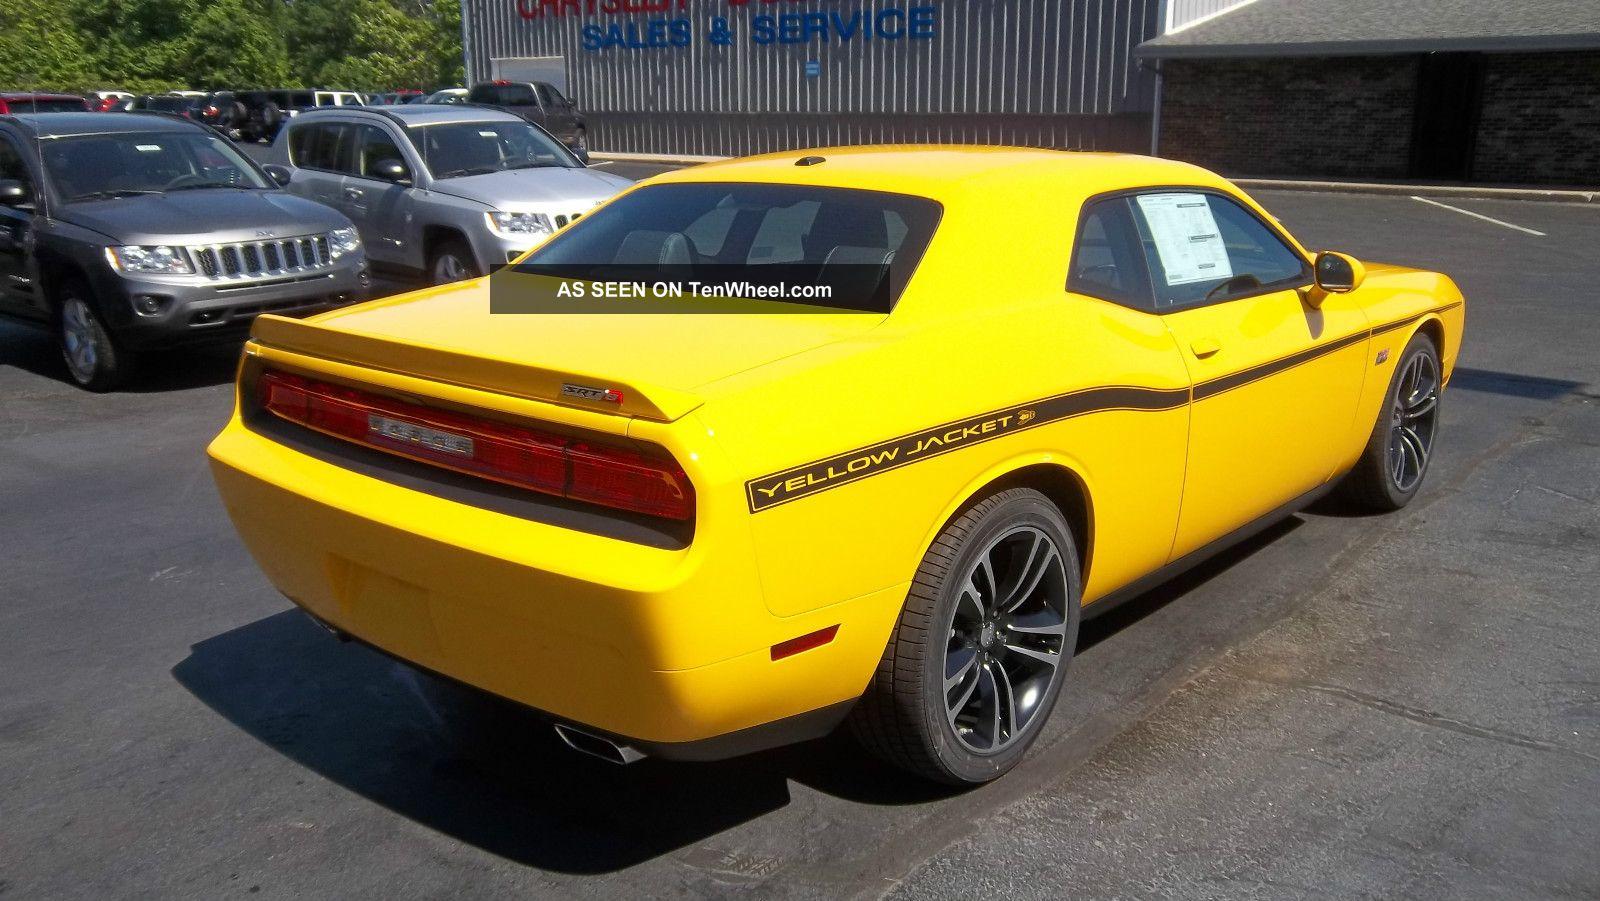 2012 Dodge Challenger Srt8 Yellow Jacket Stinger Yellow